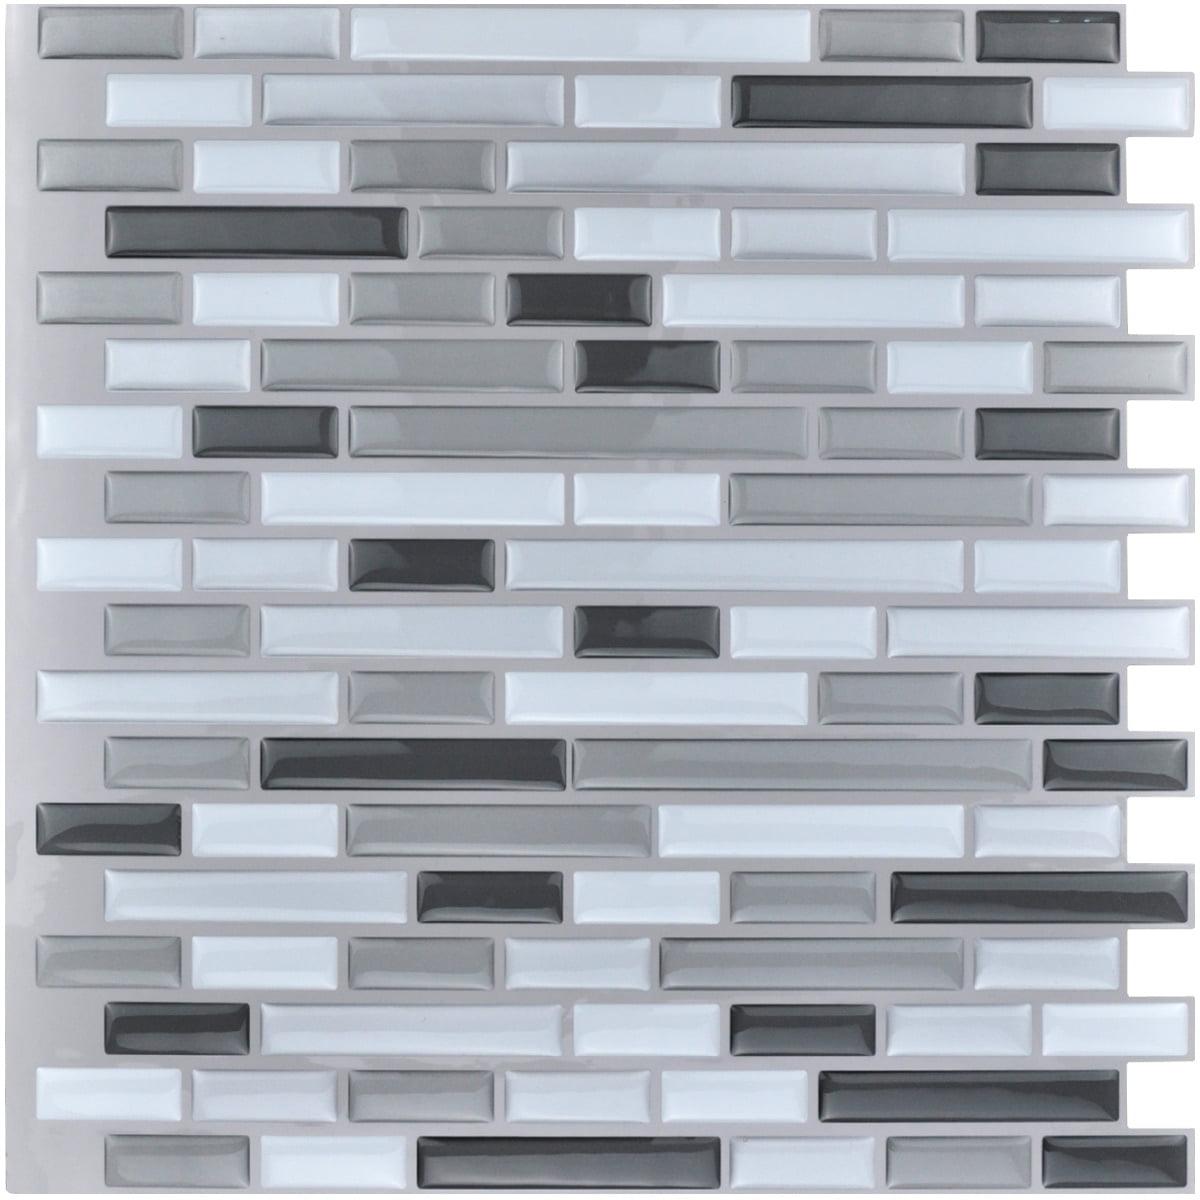 - Art3d 10-Pieces Peel And Stick Vinyl Sticker Kitchen Backsplash Tiles, 12